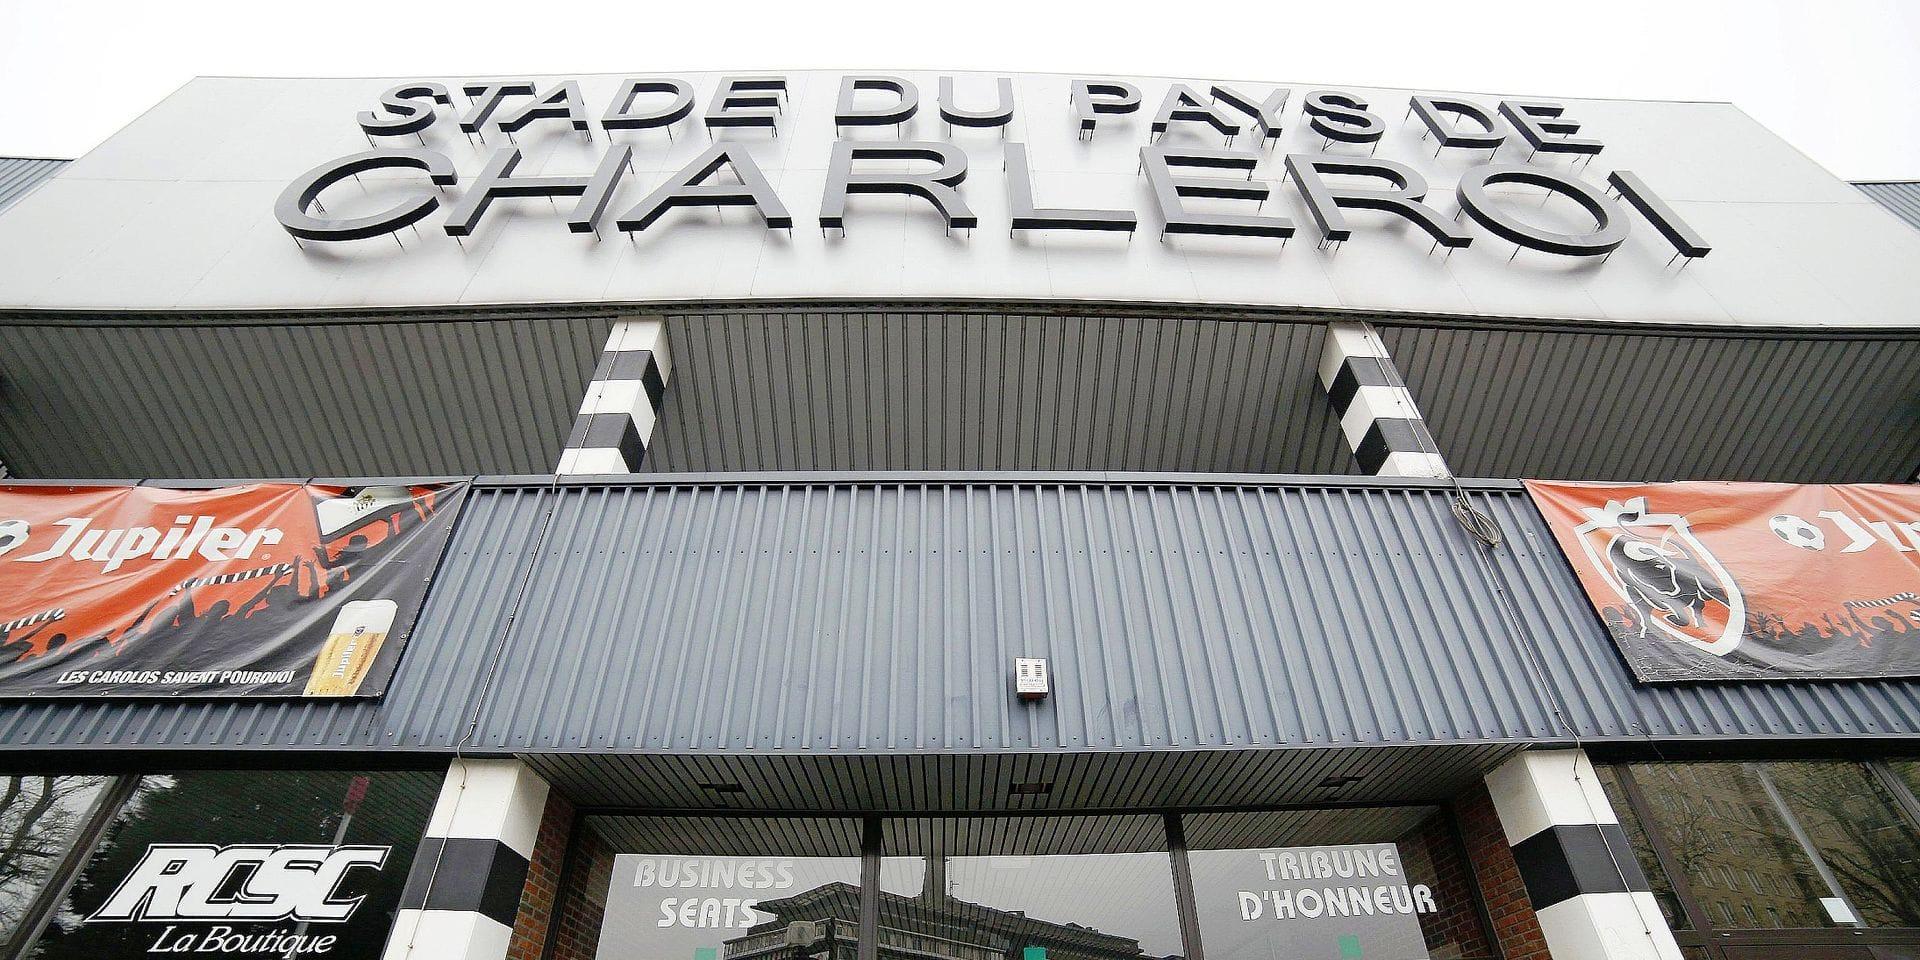 20101122 - CHARLEROI, BELGIUM: Illustration shows the stade du Pays de Charleroi stadium of Belgian first league soccer team Sporting de Charleroi, Monday 22 November 2010 in Charleroi. BELGA PHOTO BRUNO FAHY